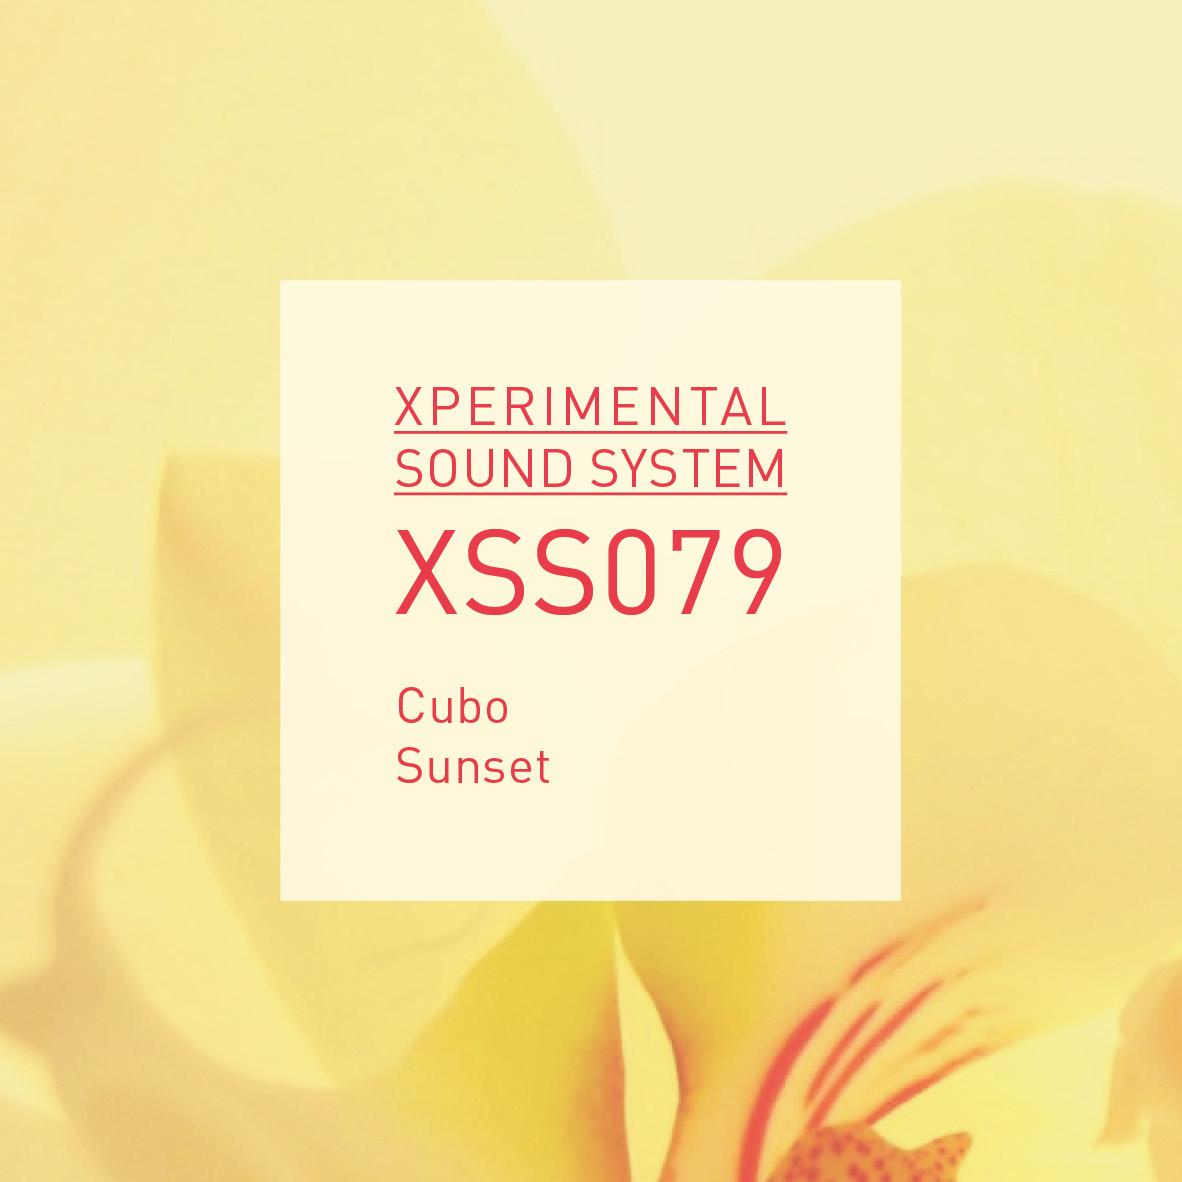 XSS079  |  Cubo  |  Sunset